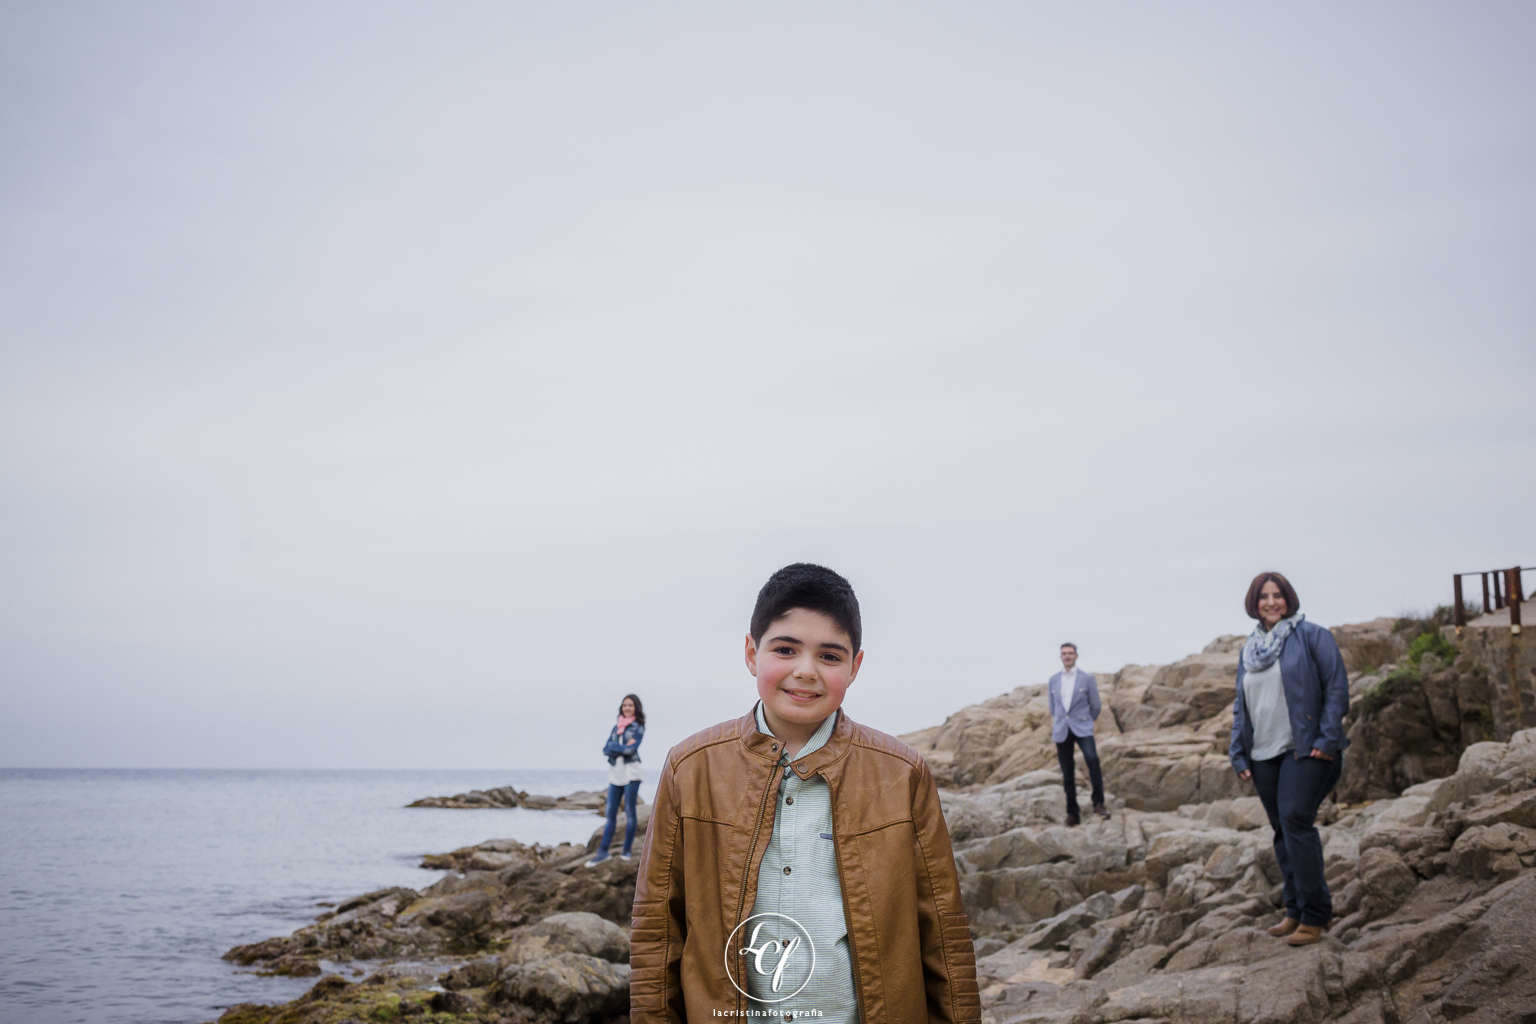 fotografia primera comunión :: fotógrafo primera comunión :: primera comunión en la playa :: fotografo blanes